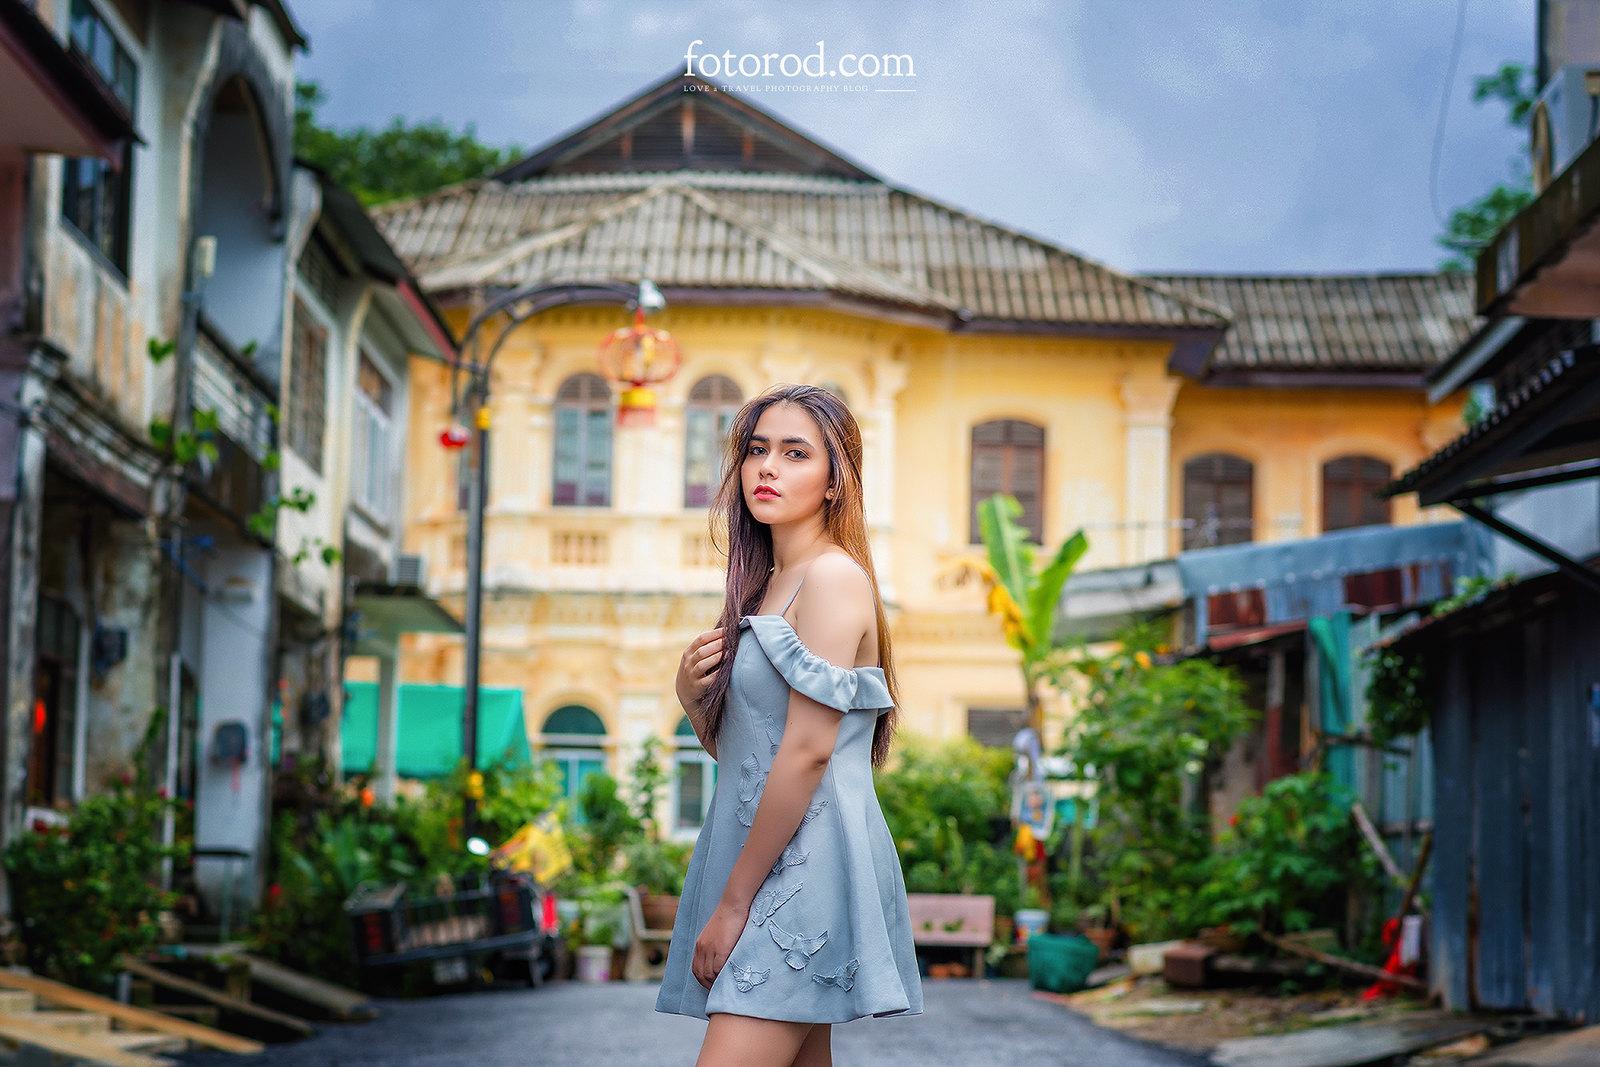 Portrait Profile Photography by Fotorod Love travel & photography